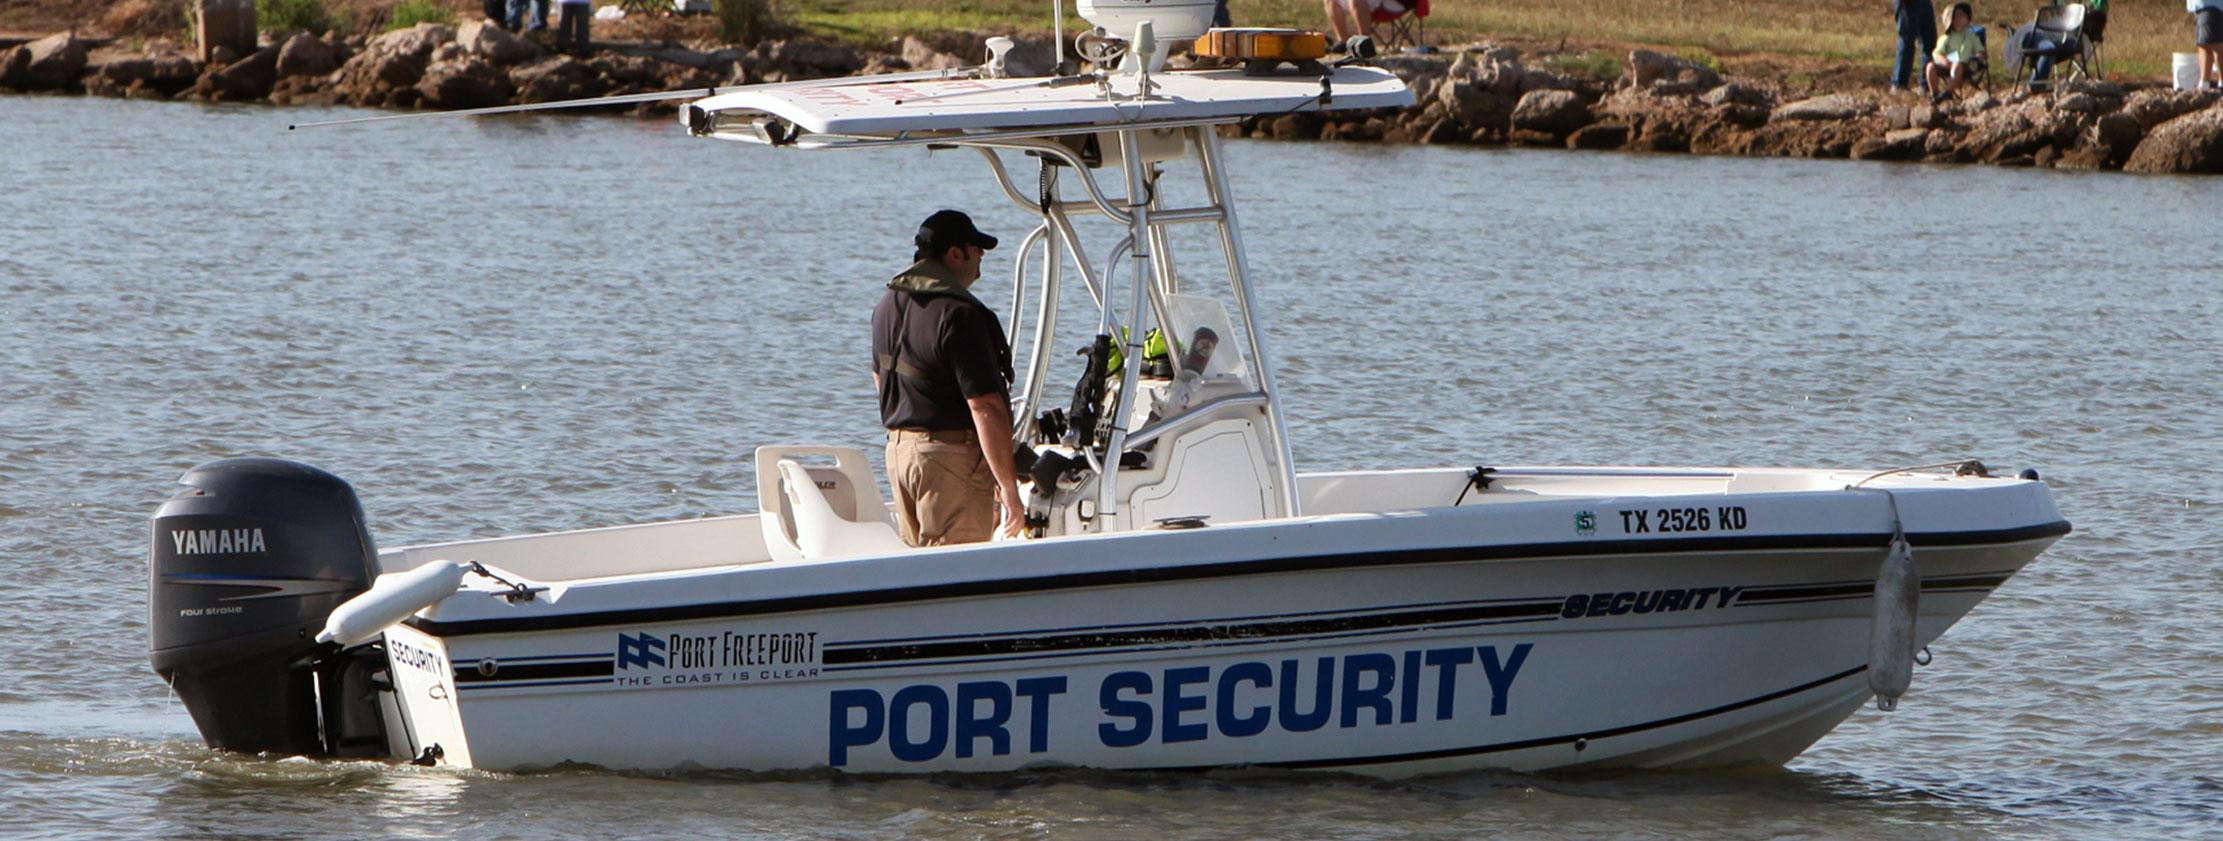 port security at port freeport texas